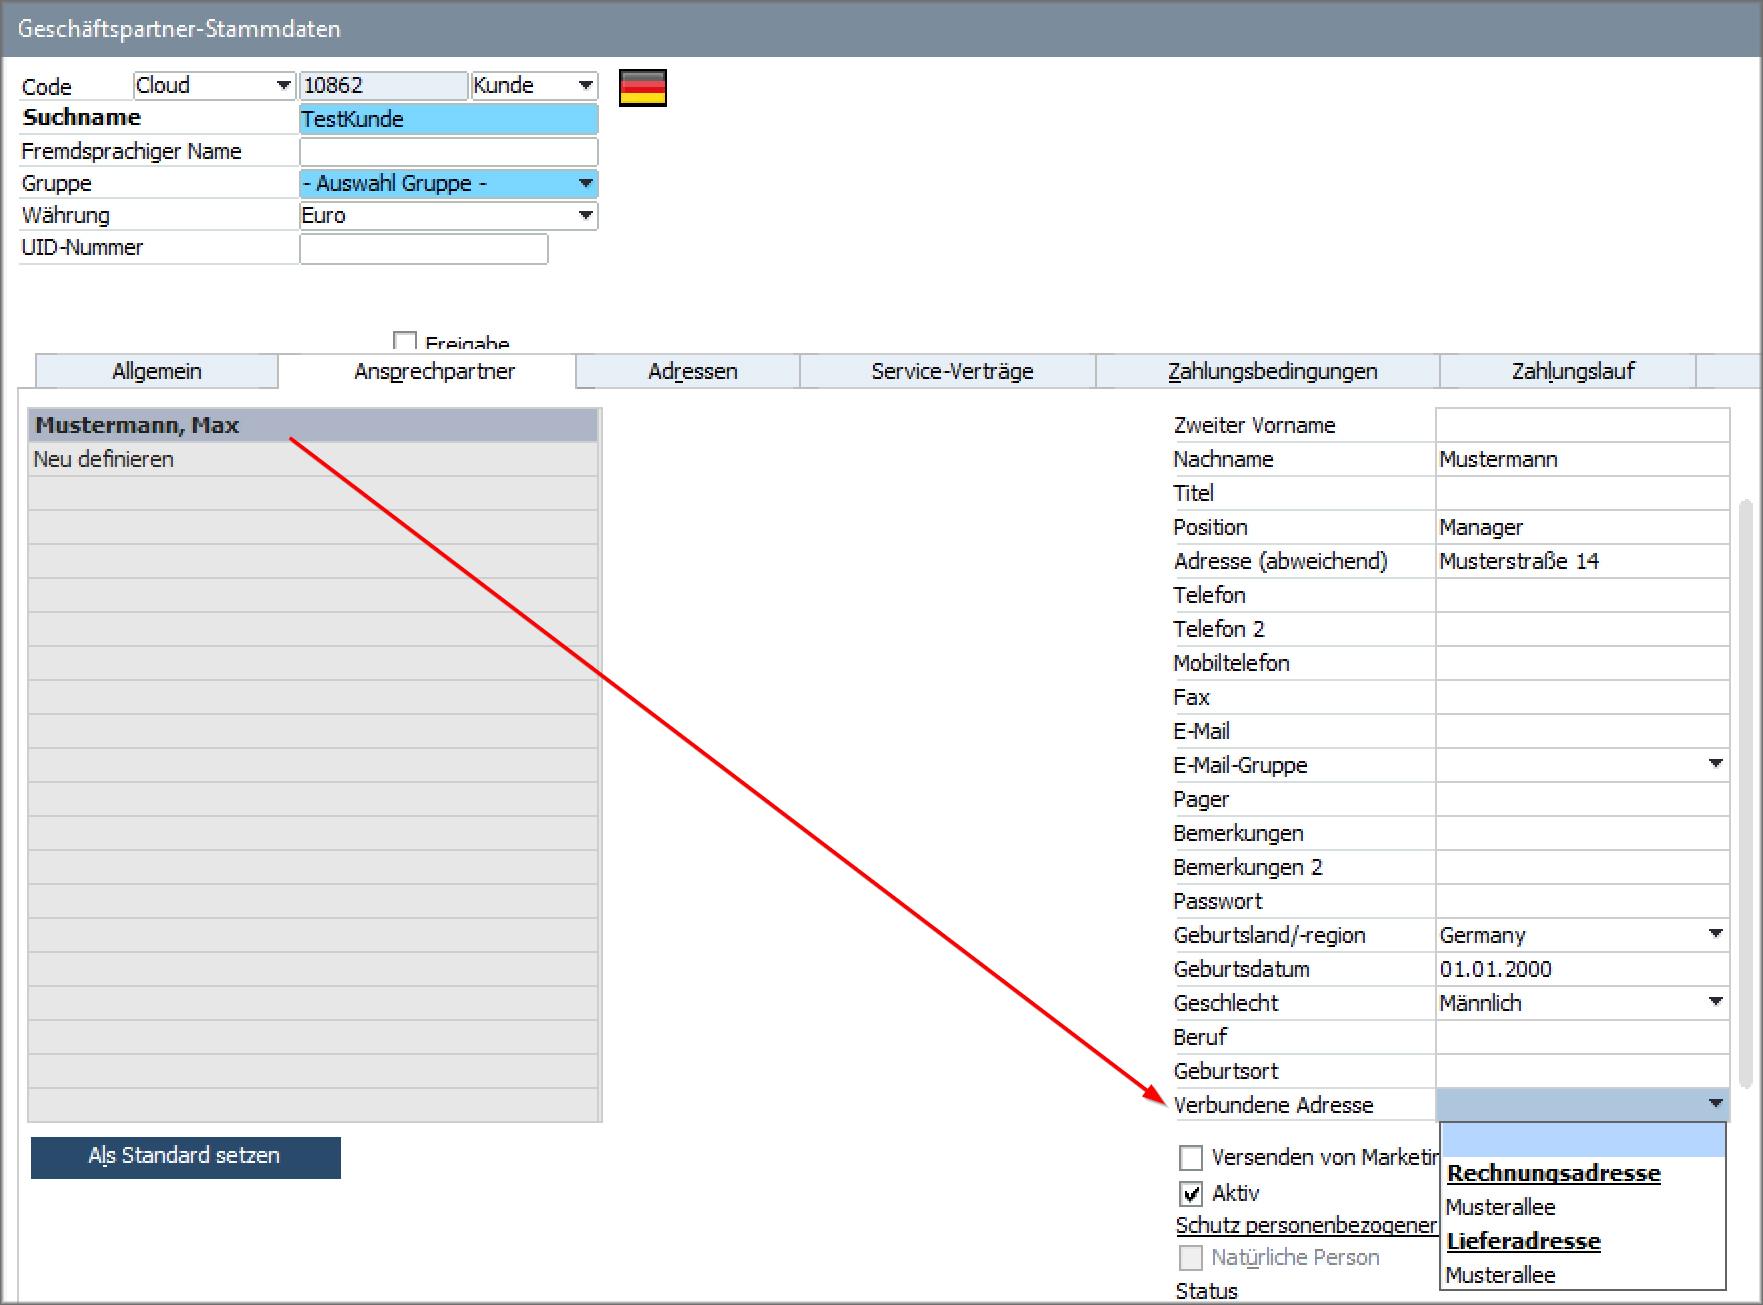 SAP Verbundene Adresse